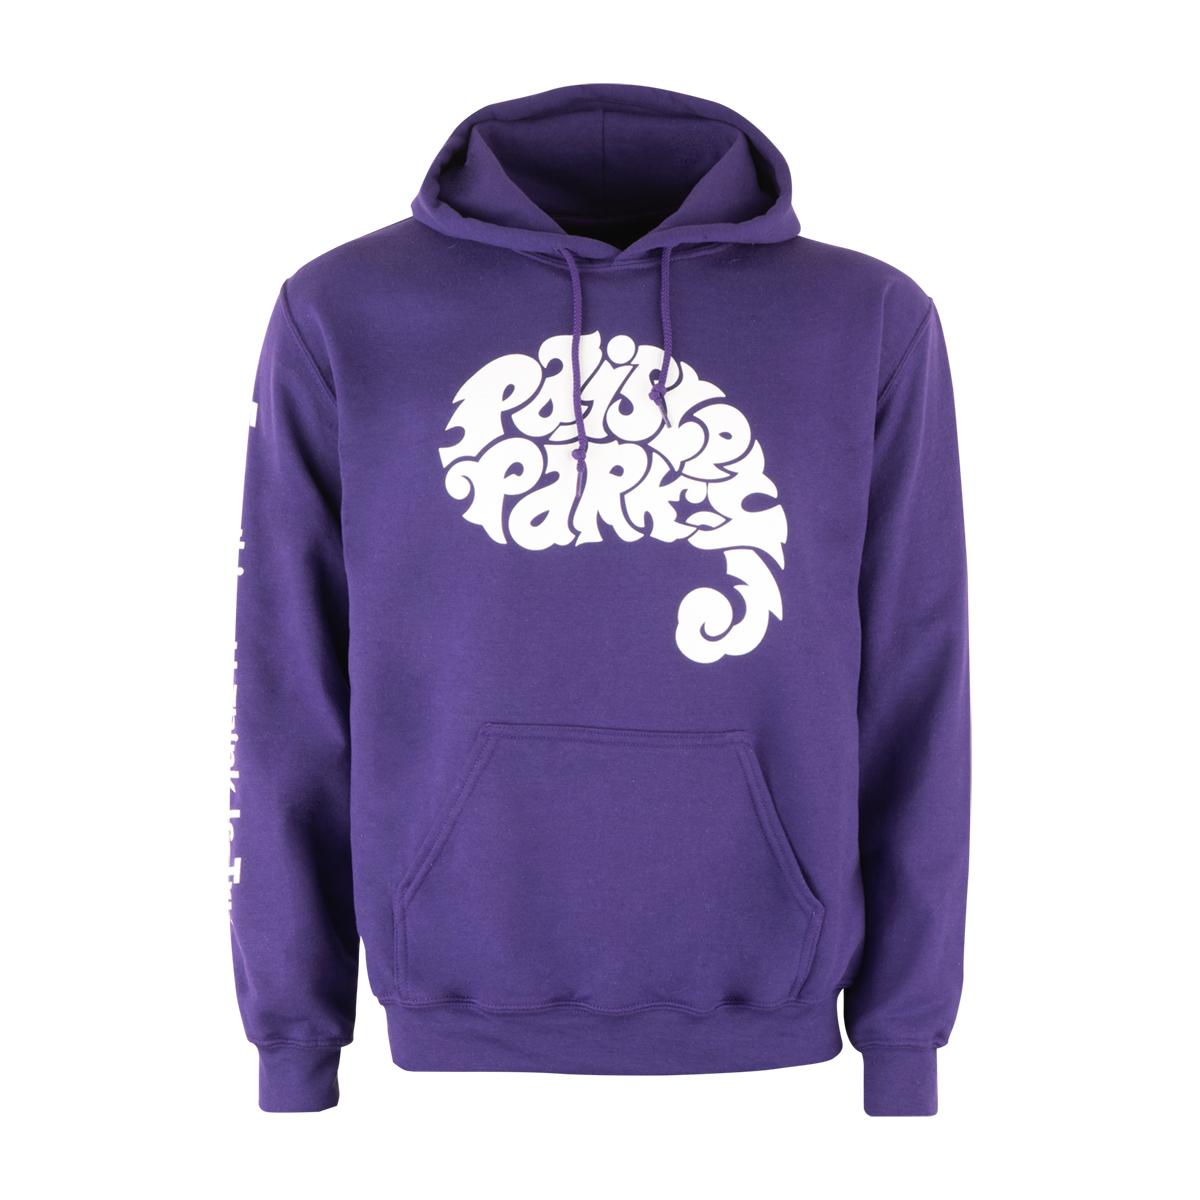 Paisley Park Logo Hoodie